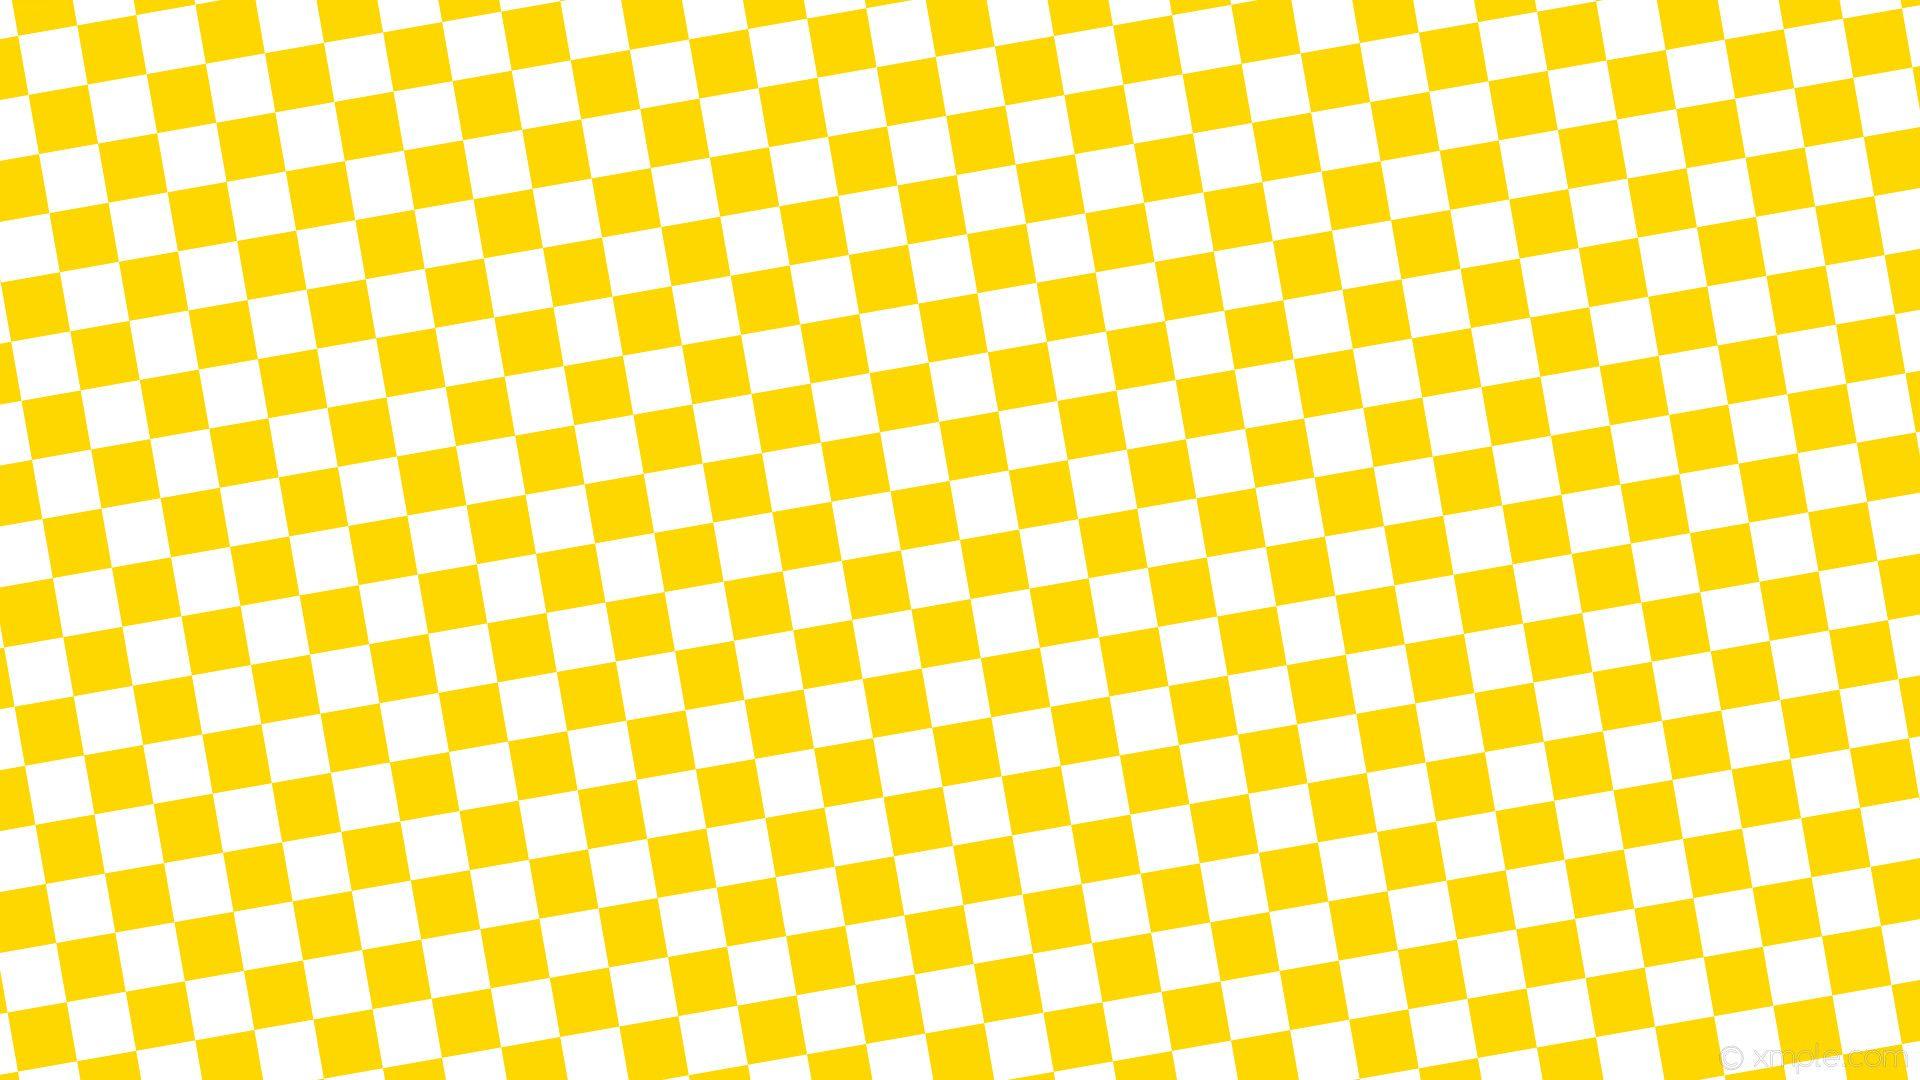 yellow space aesthetic